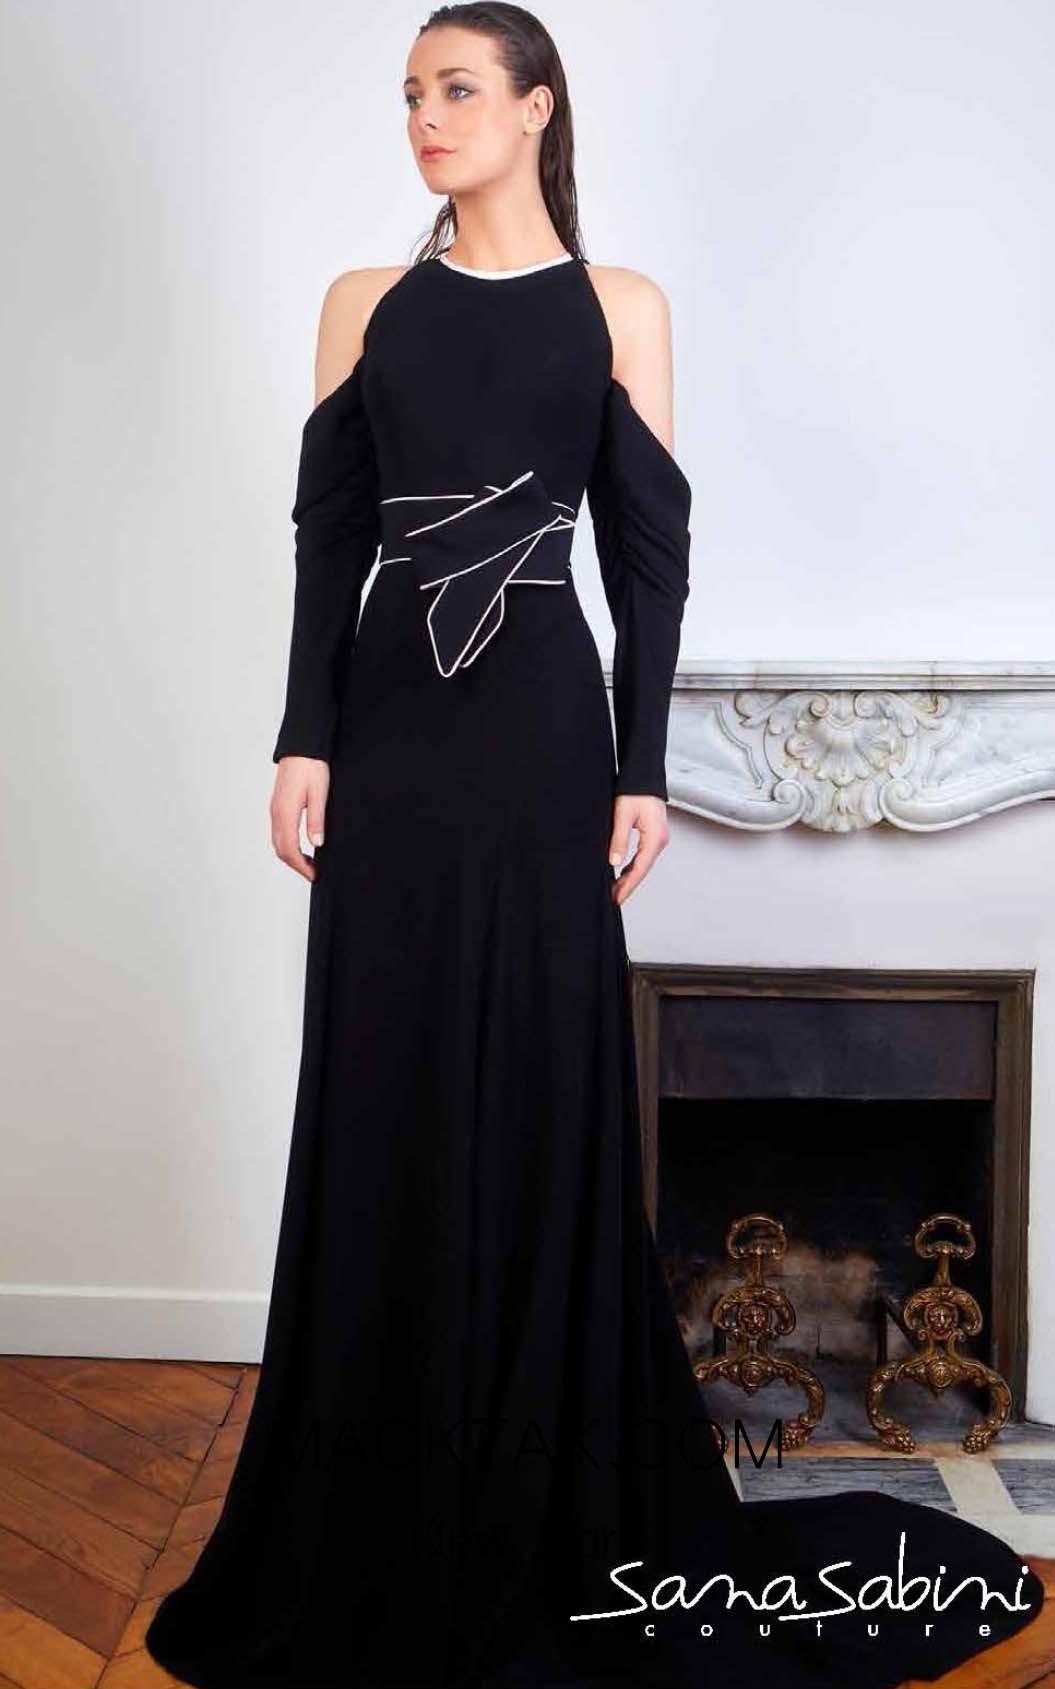 Sana Sabini 9349 Black White Front Evening Dress